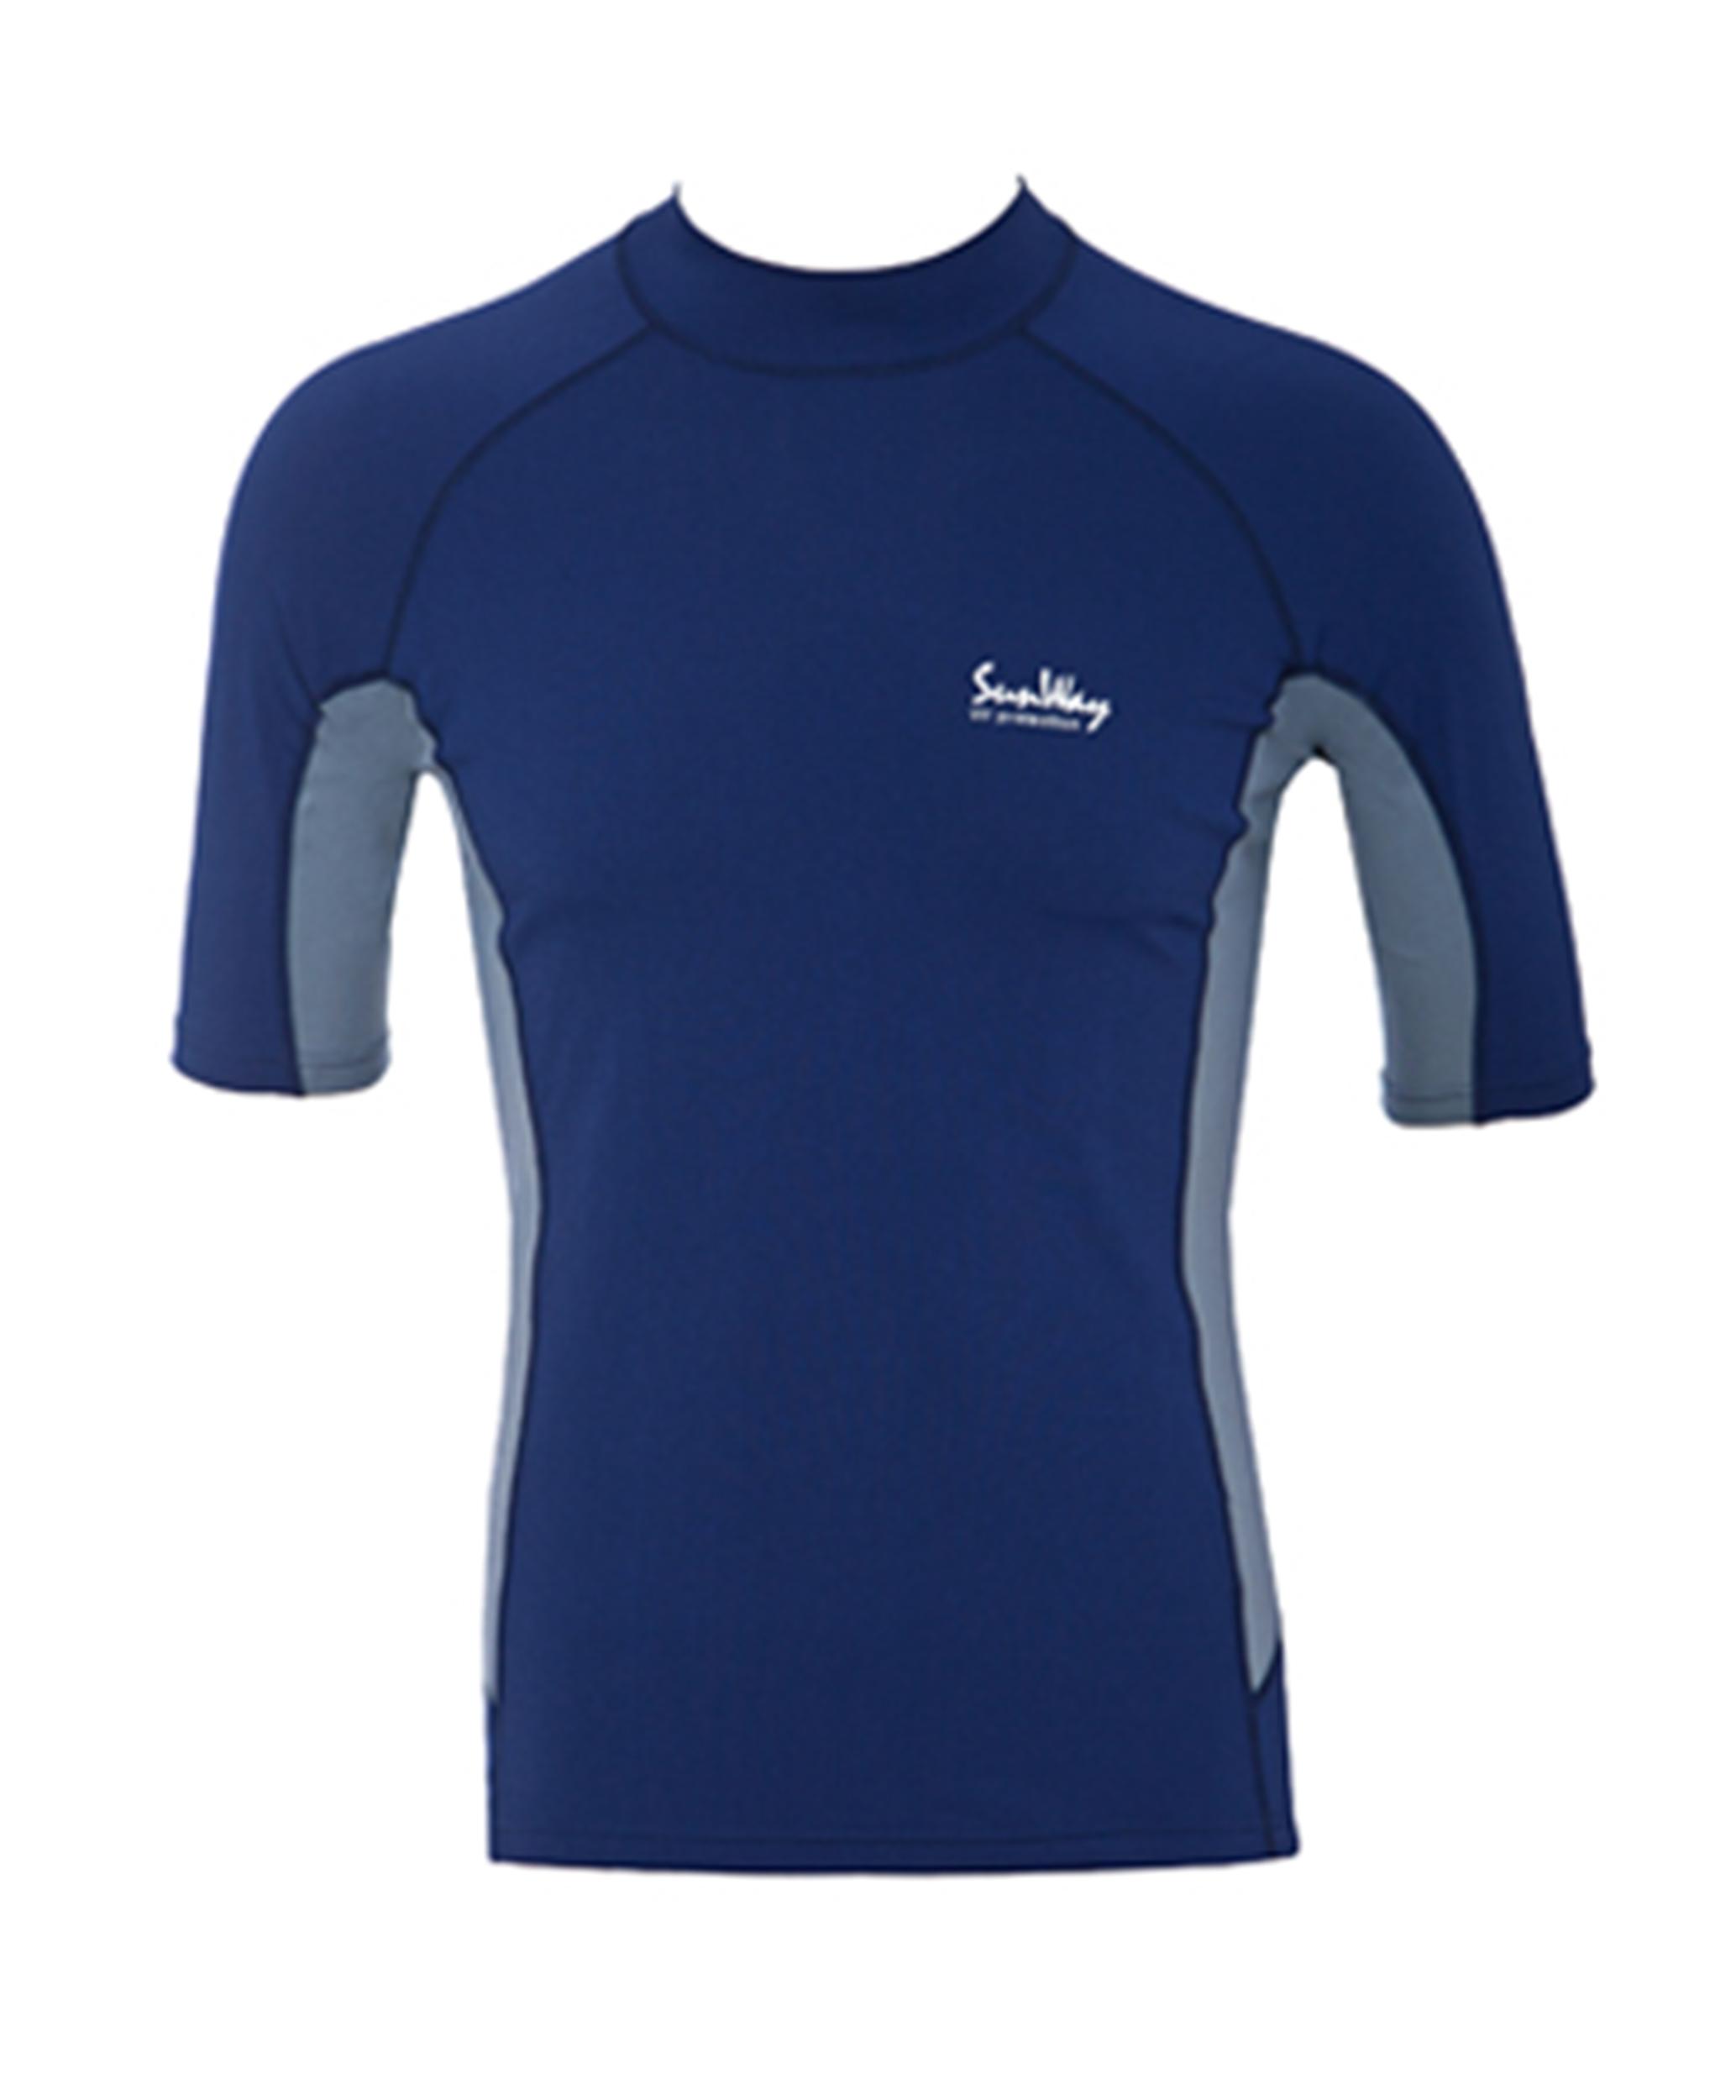 Men Navy and Gray UV Rash Guard Shirt